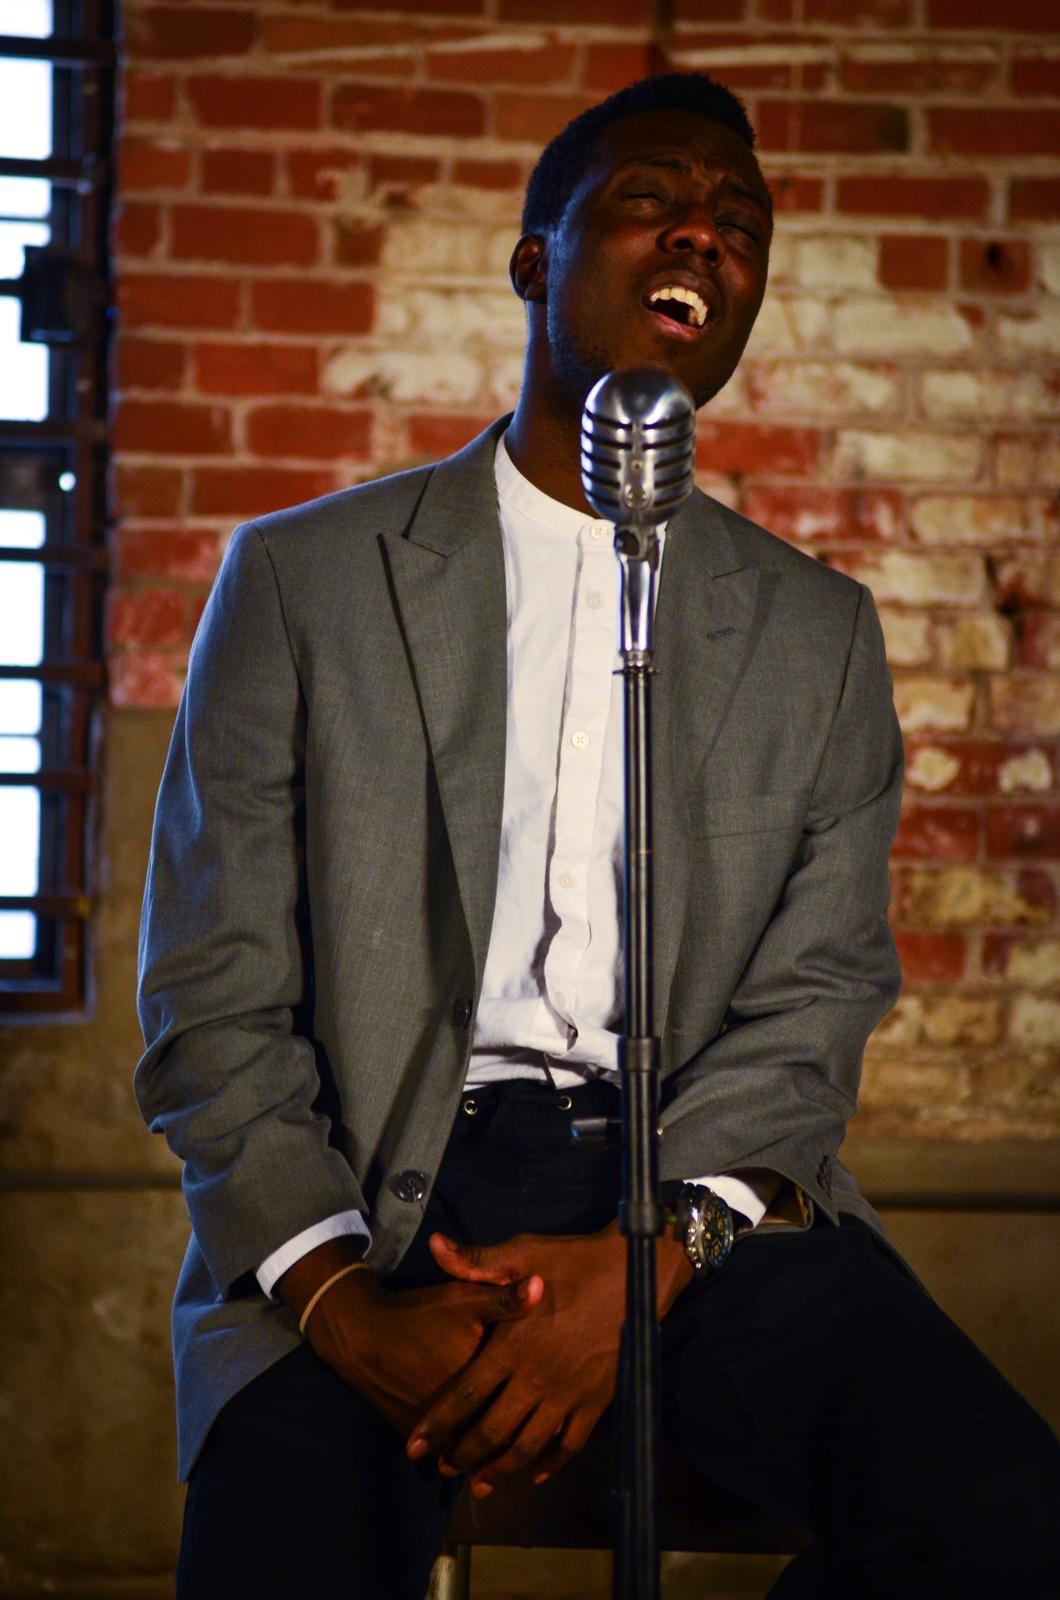 Singer Sam Opoku Tops Urban Radio Charts in Ghana